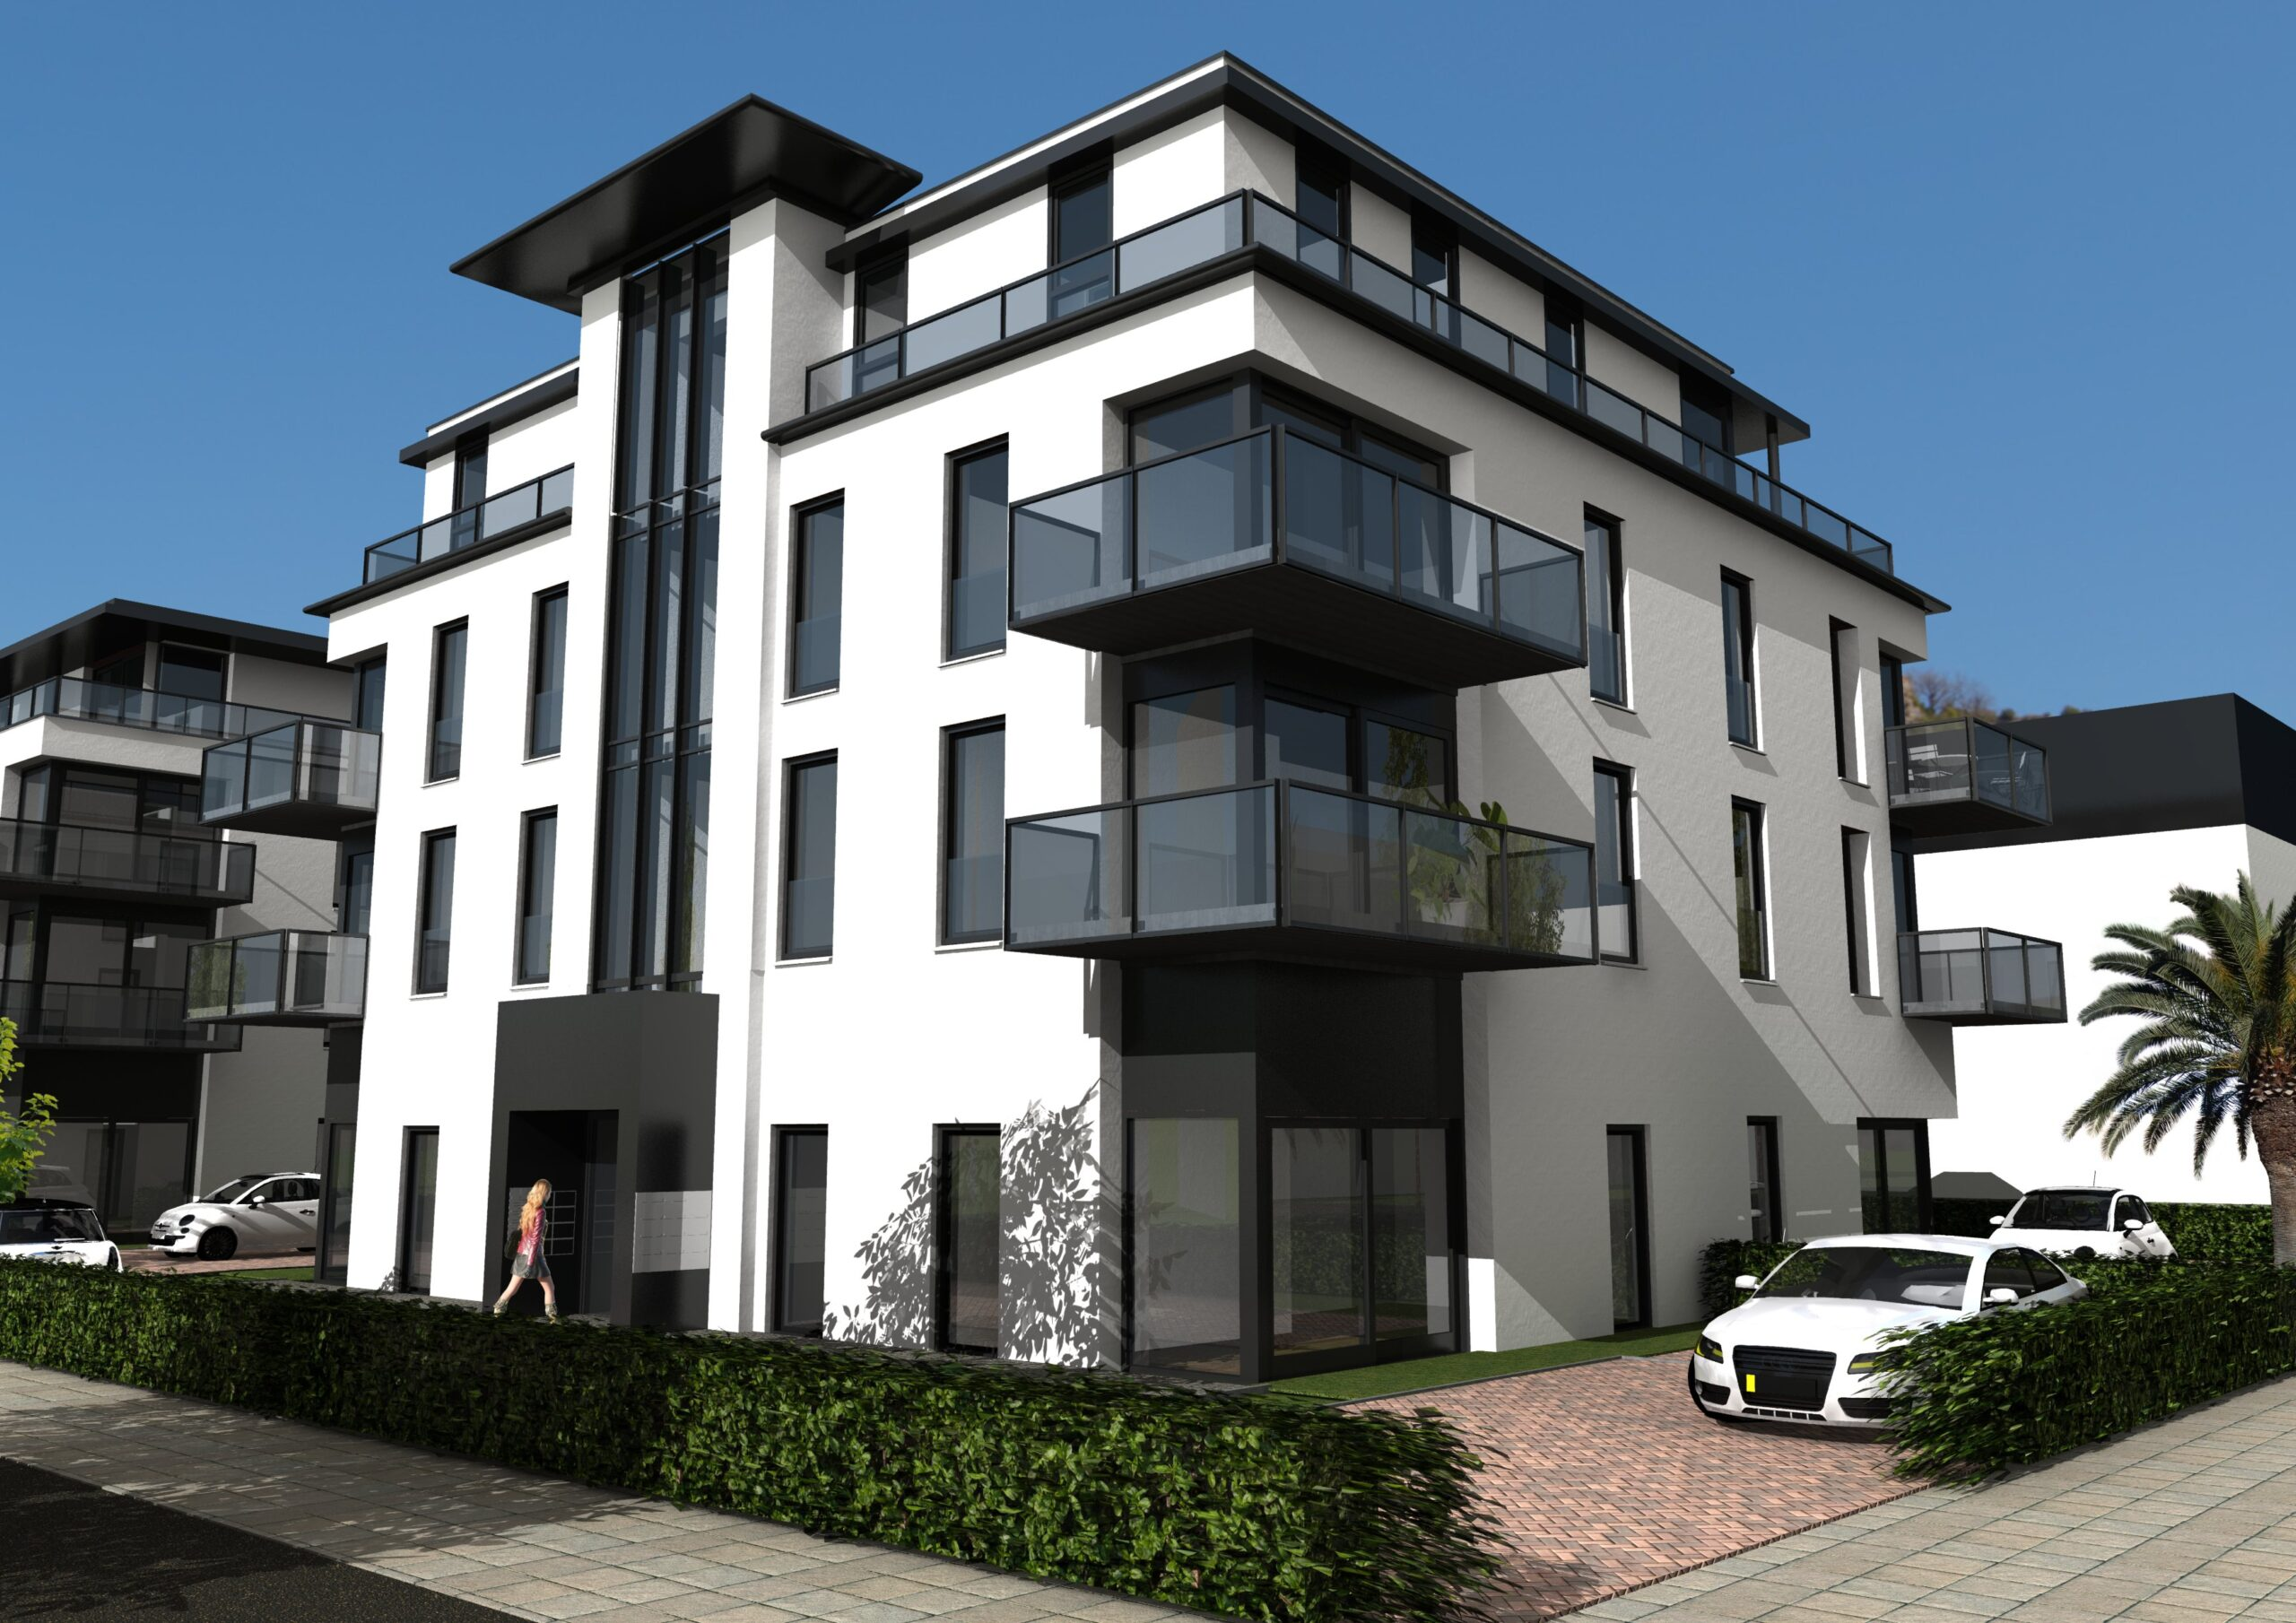 Oasis-Beach-Penthouse-almere-poort-nieuwbouw